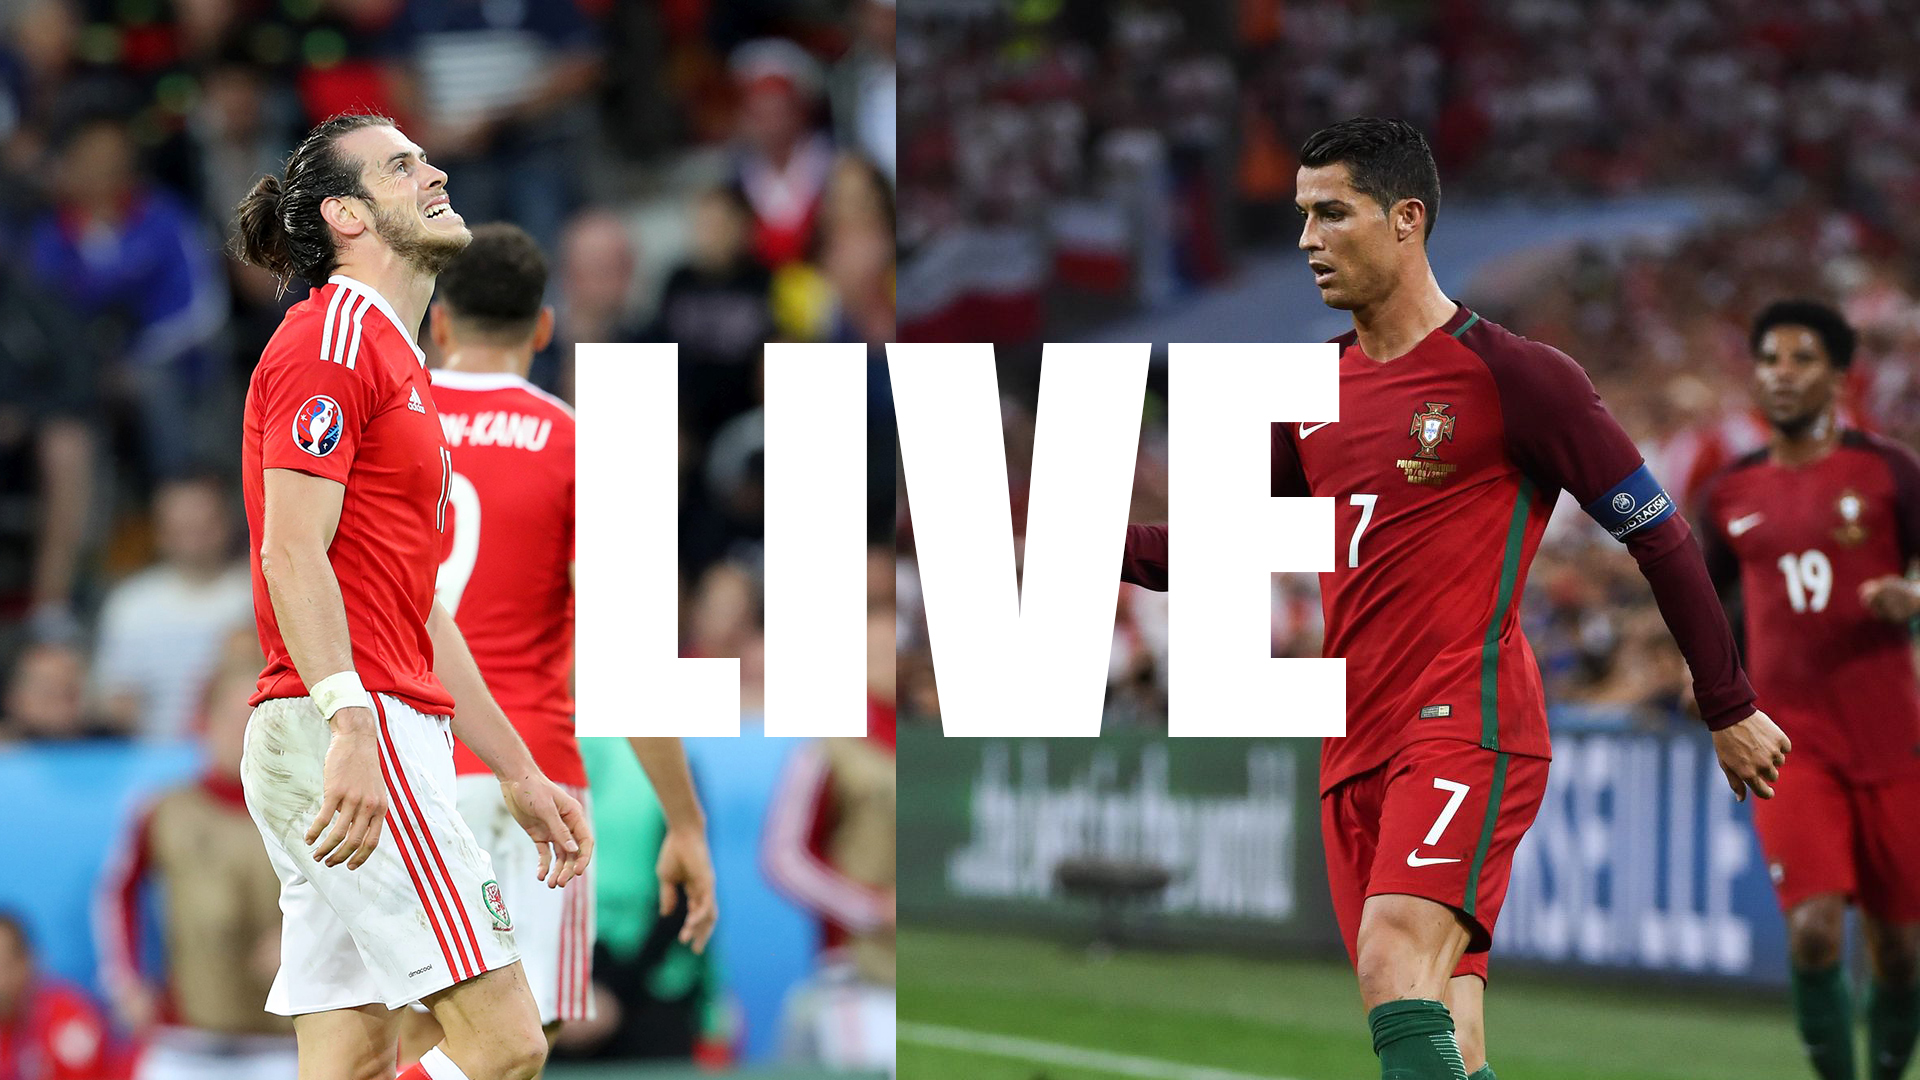 Portugalia - Tara Galilor SCOR 0-0 SEMIFINALA EURO 2016